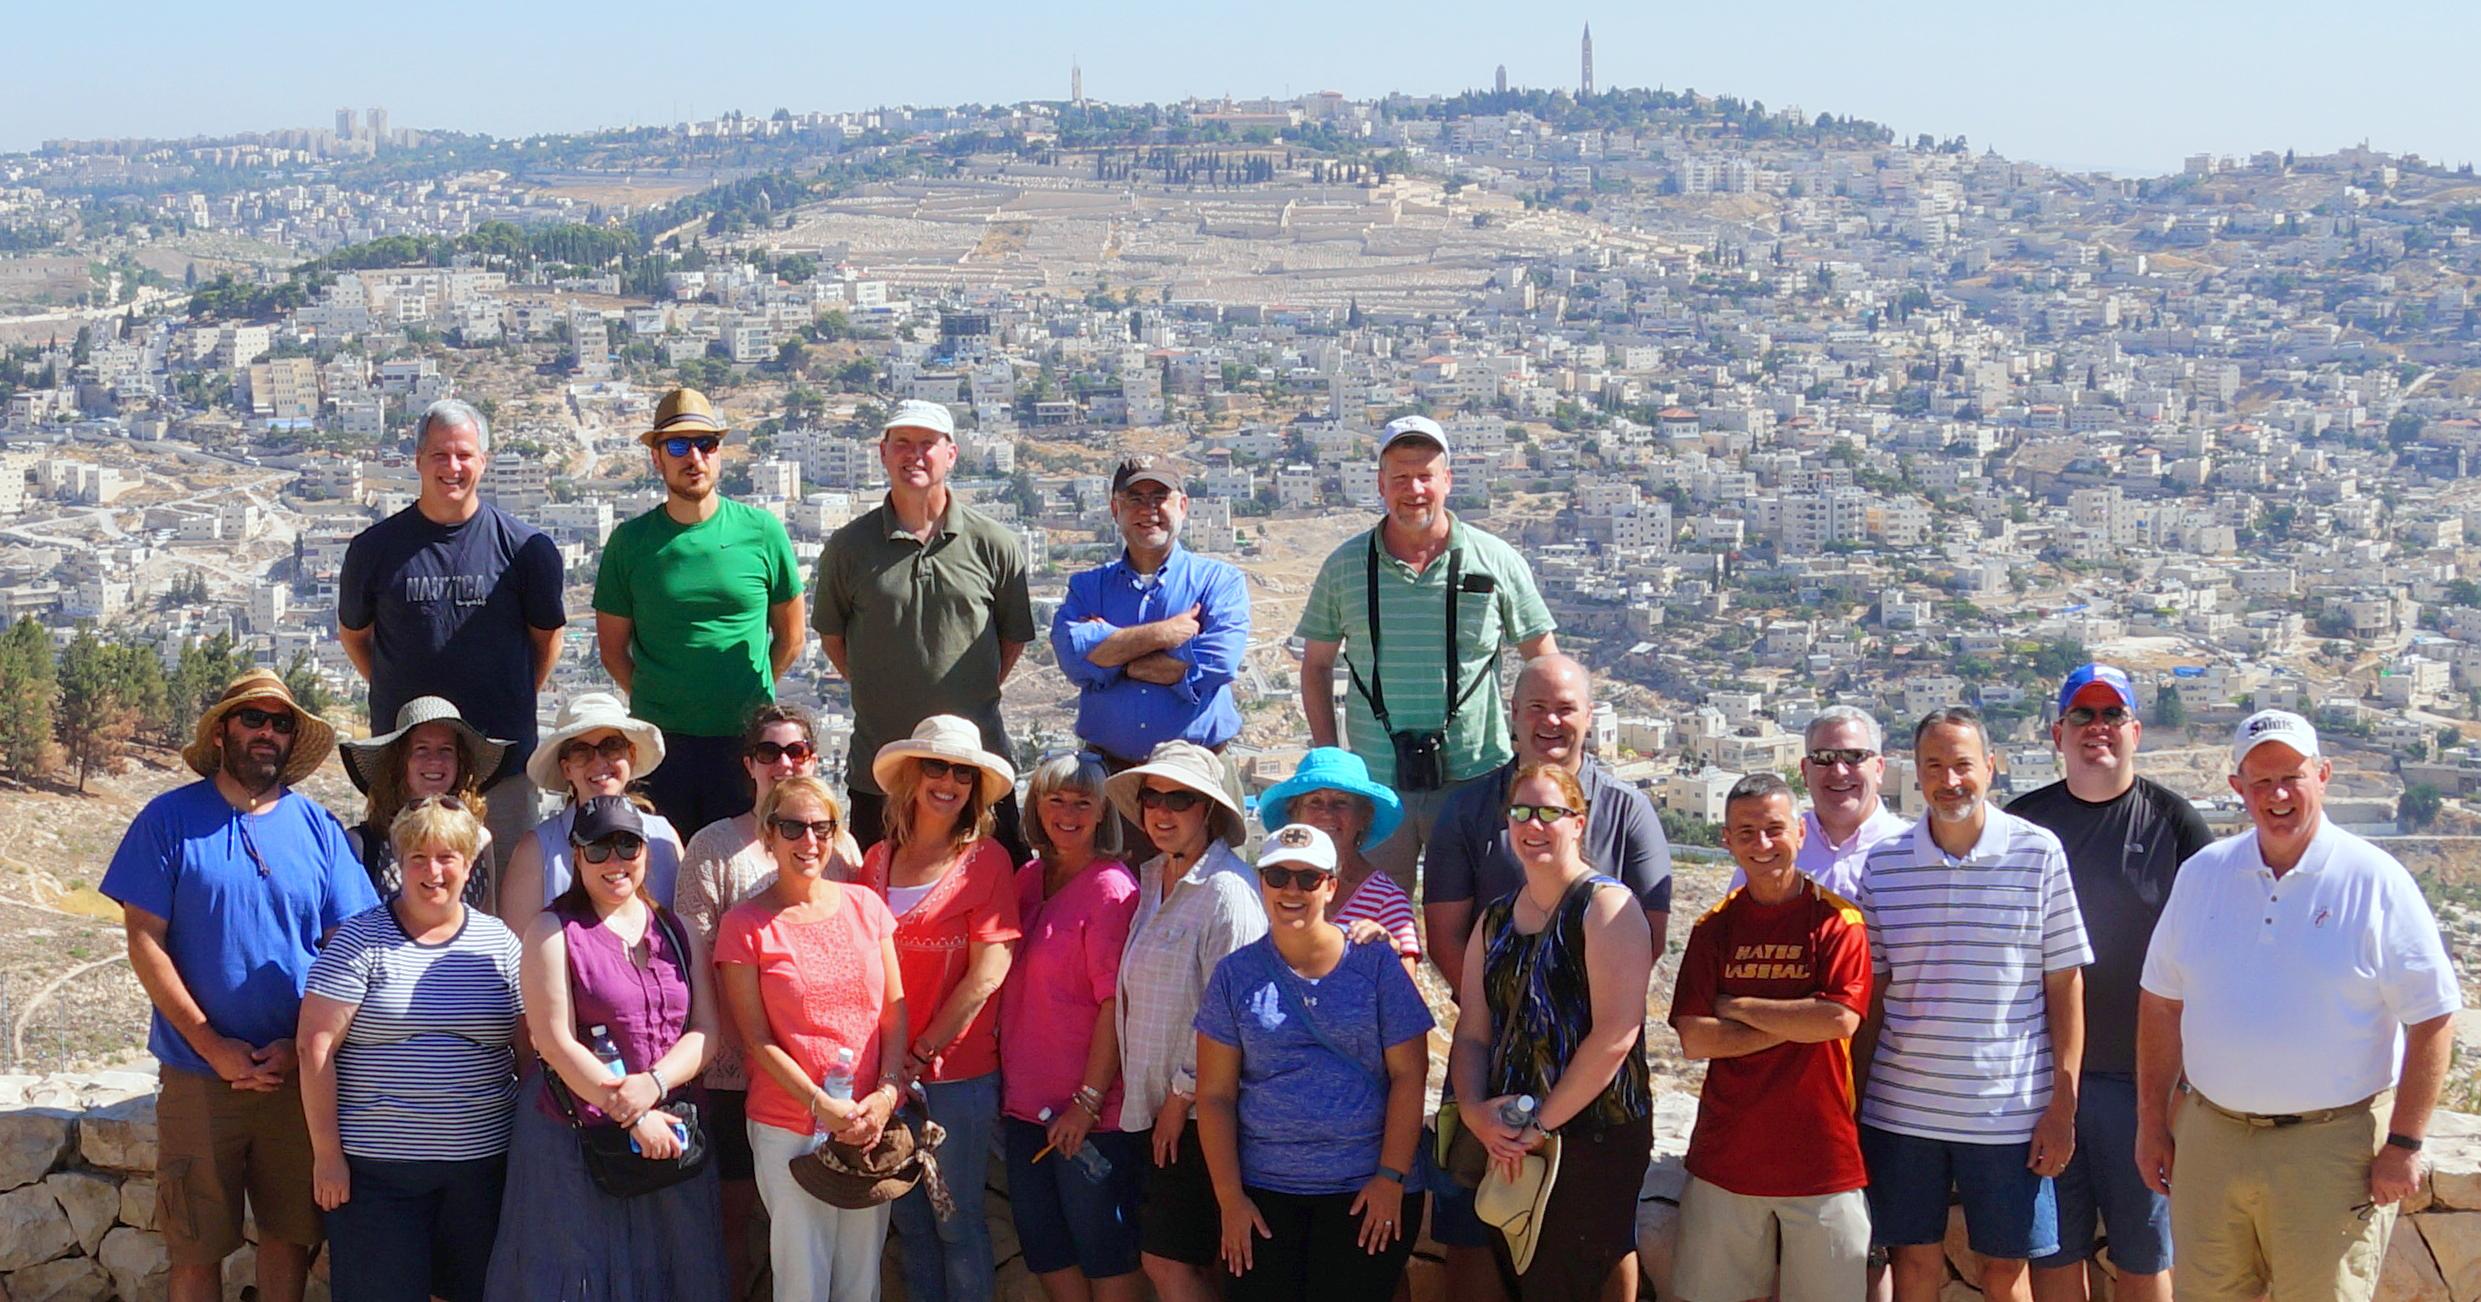 Bearing-Witness-2016-Israel